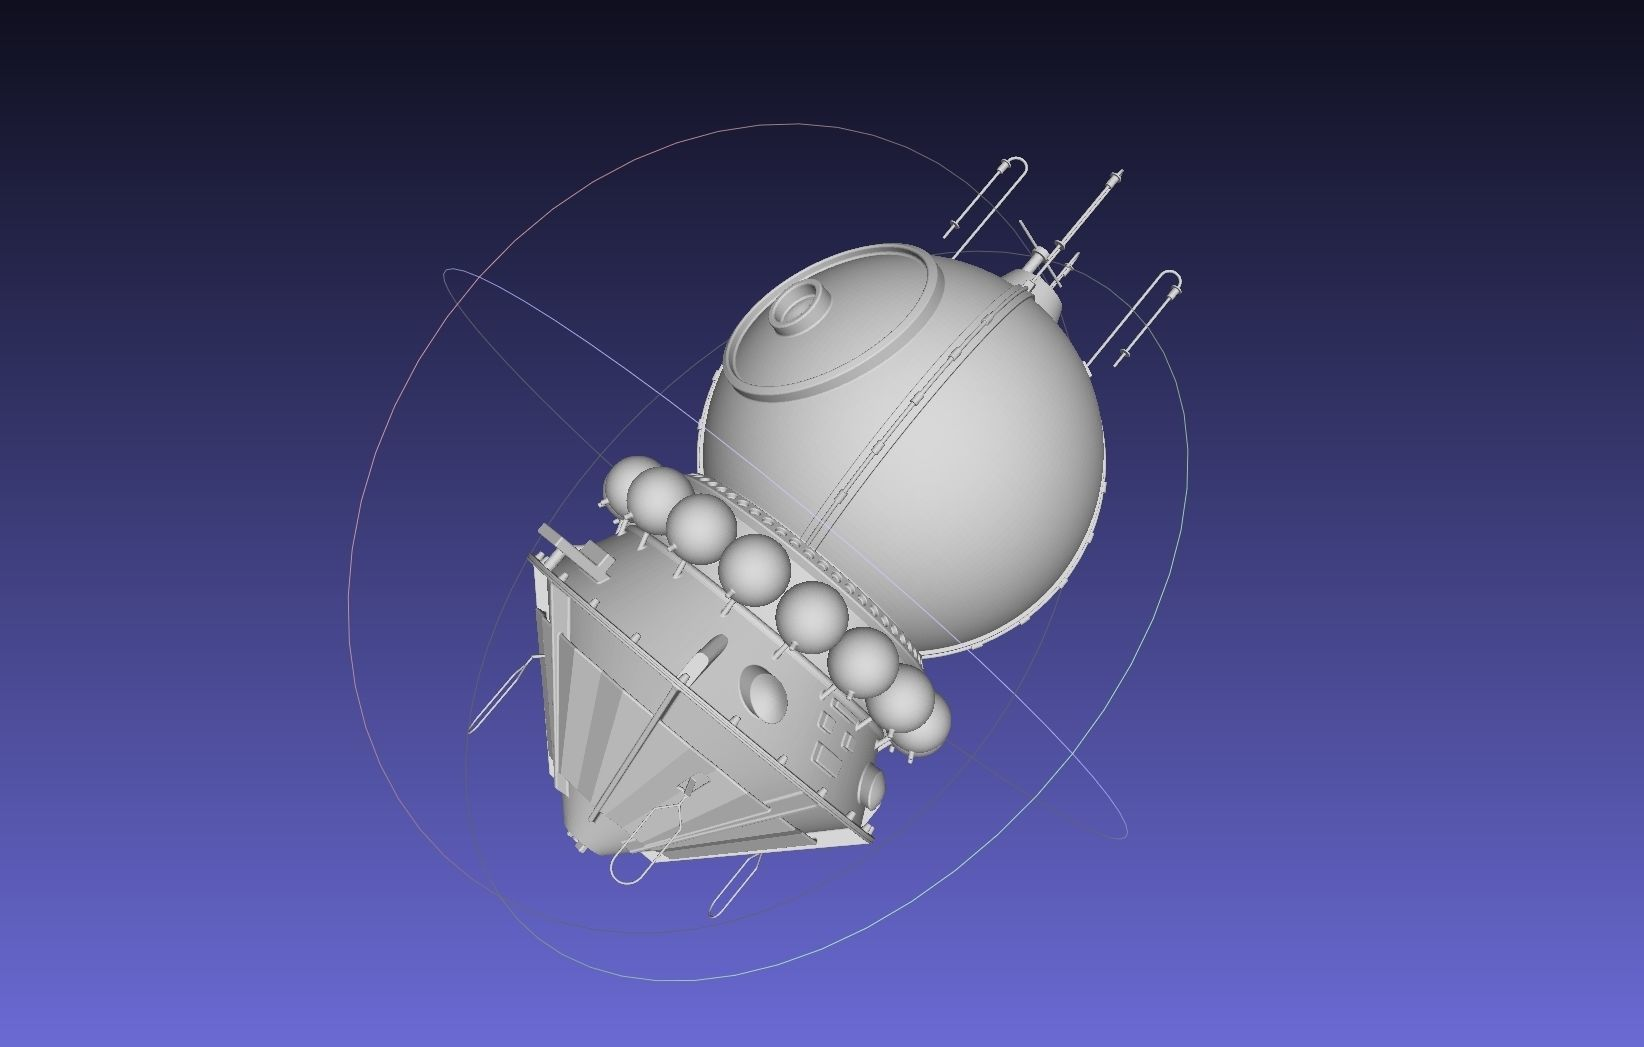 Basic Vostok 1 Vostok 3KA Space Capsule Printable Model